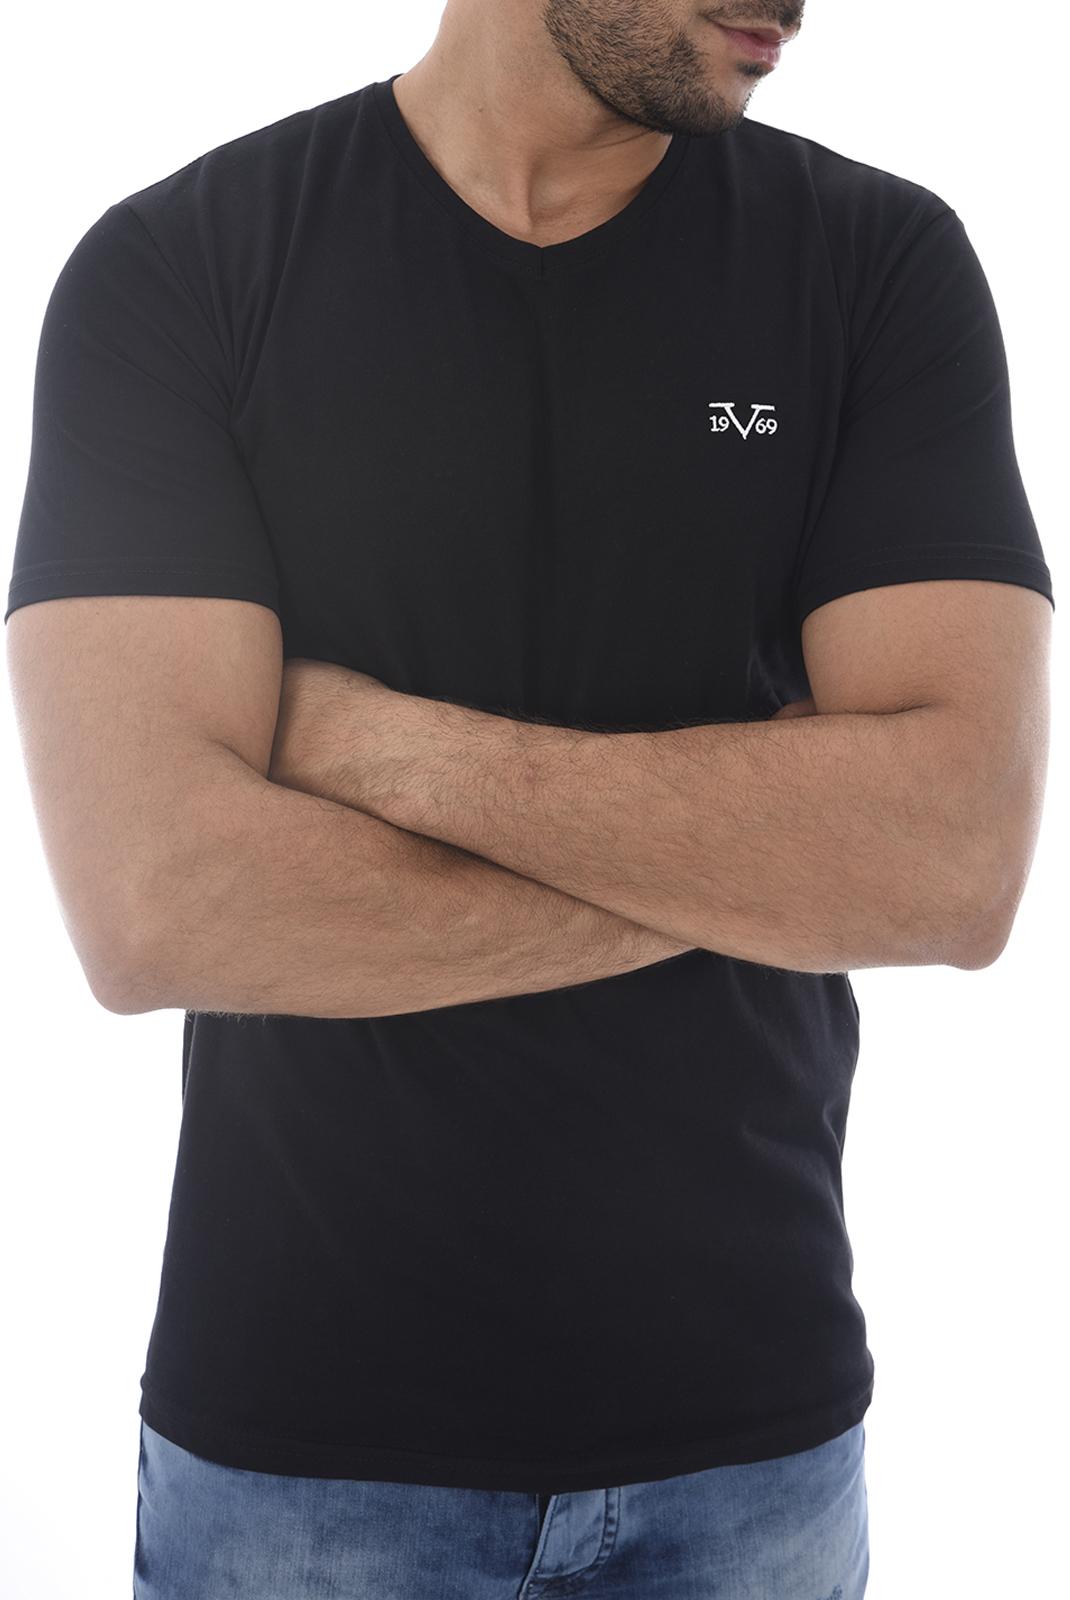 Tee-shirts  19V69 by Versace 1969 MODENE 2 NOIR